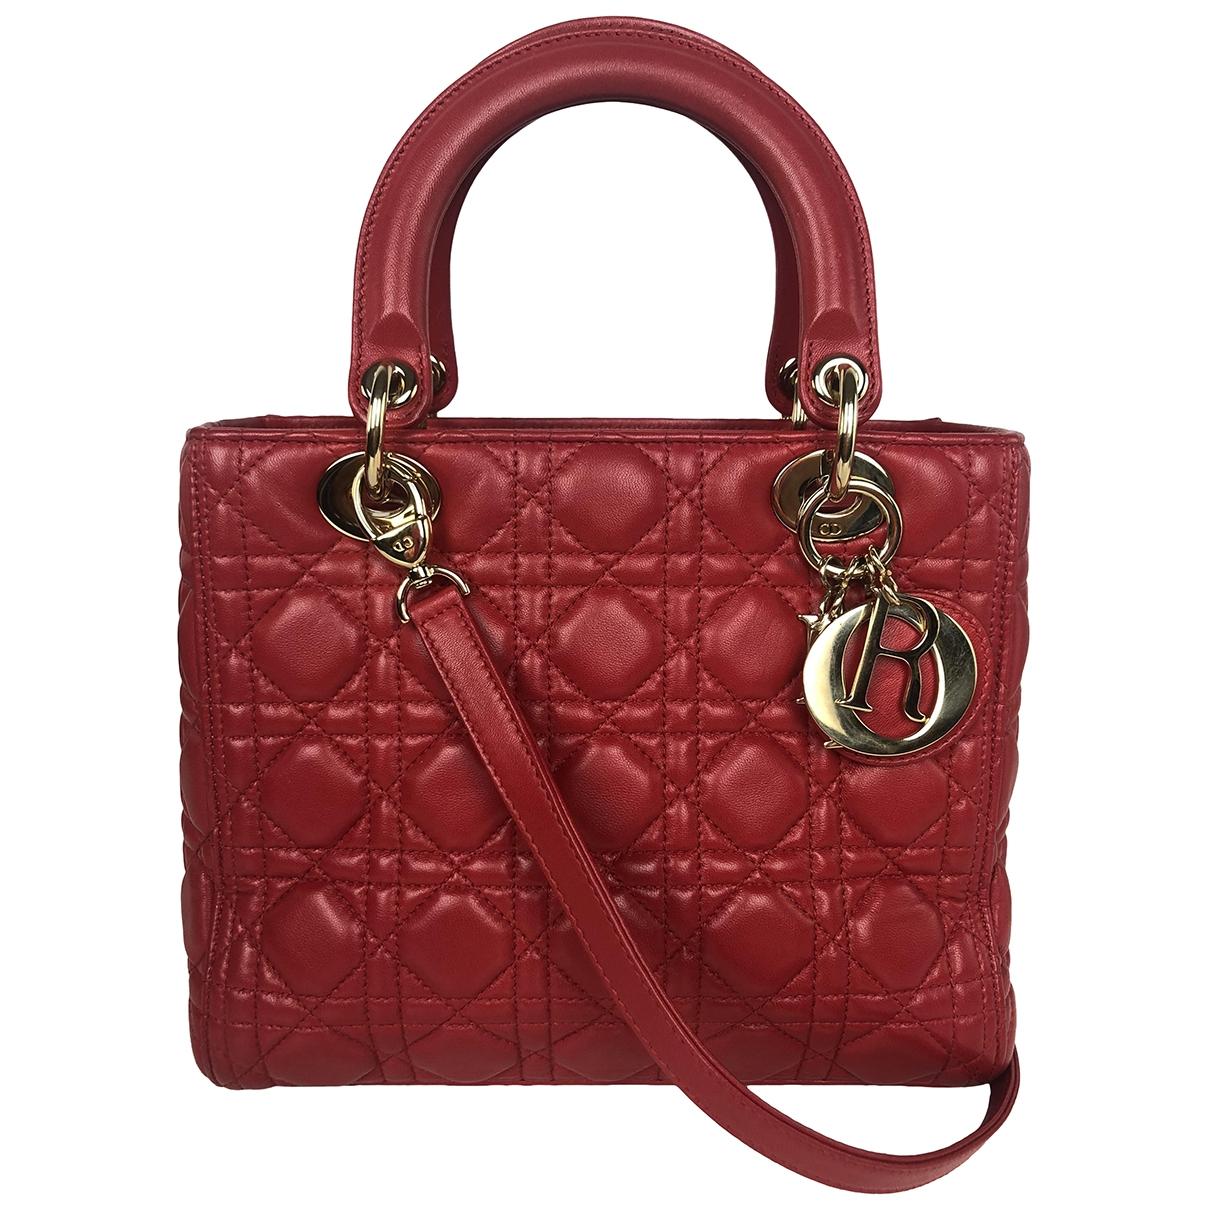 Dior - Sac a main Lady Dior pour femme en cuir - rouge